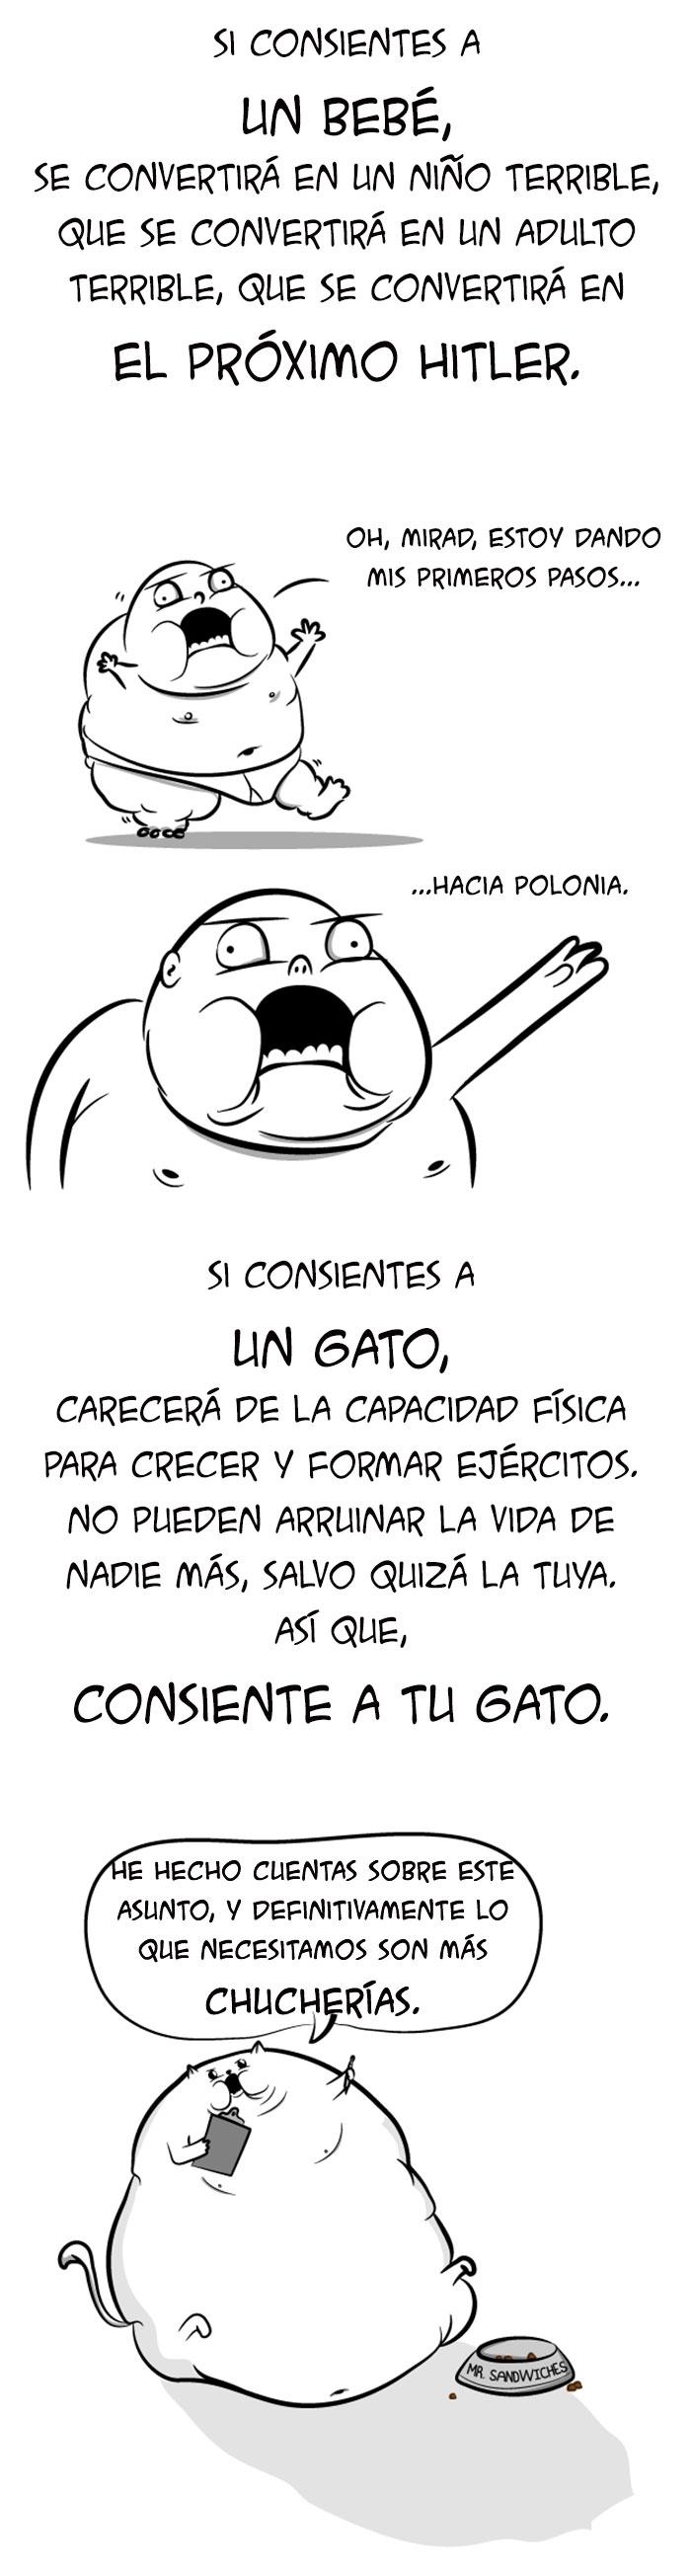 bebes-vs-gatos-04